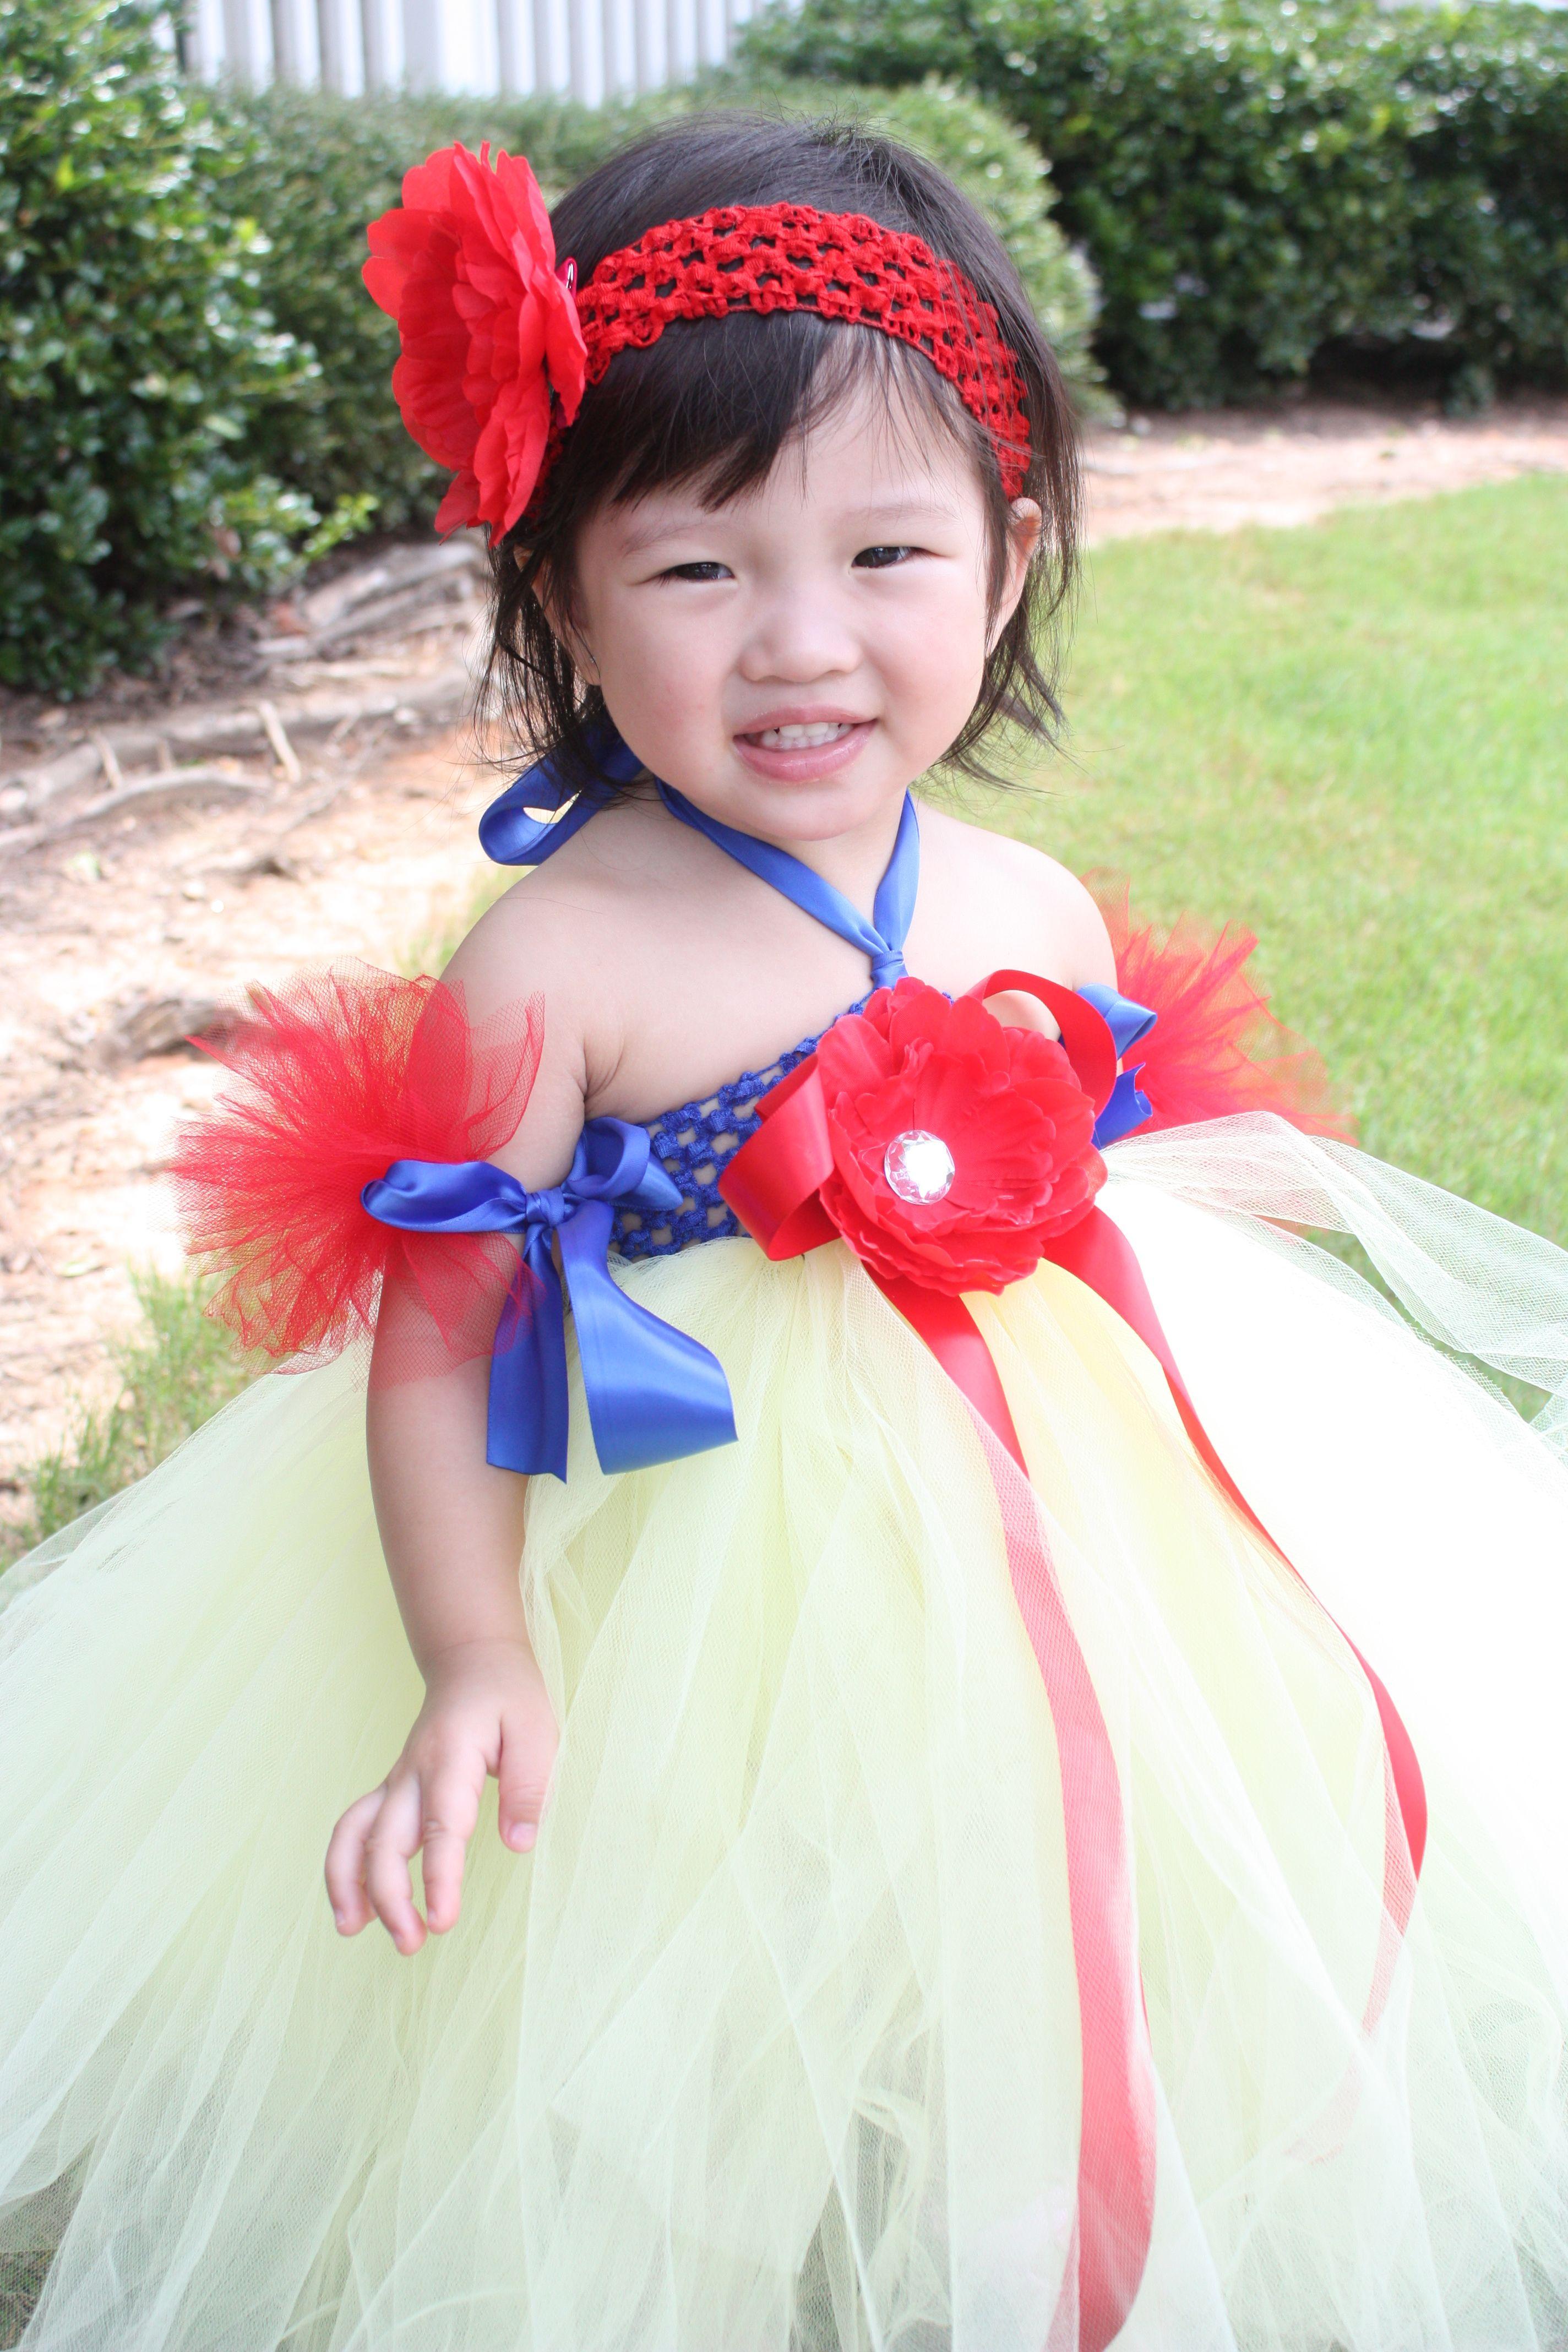 Snow white diy costume diy halloween costumes pinterest kid snow white diy costume solutioingenieria Images